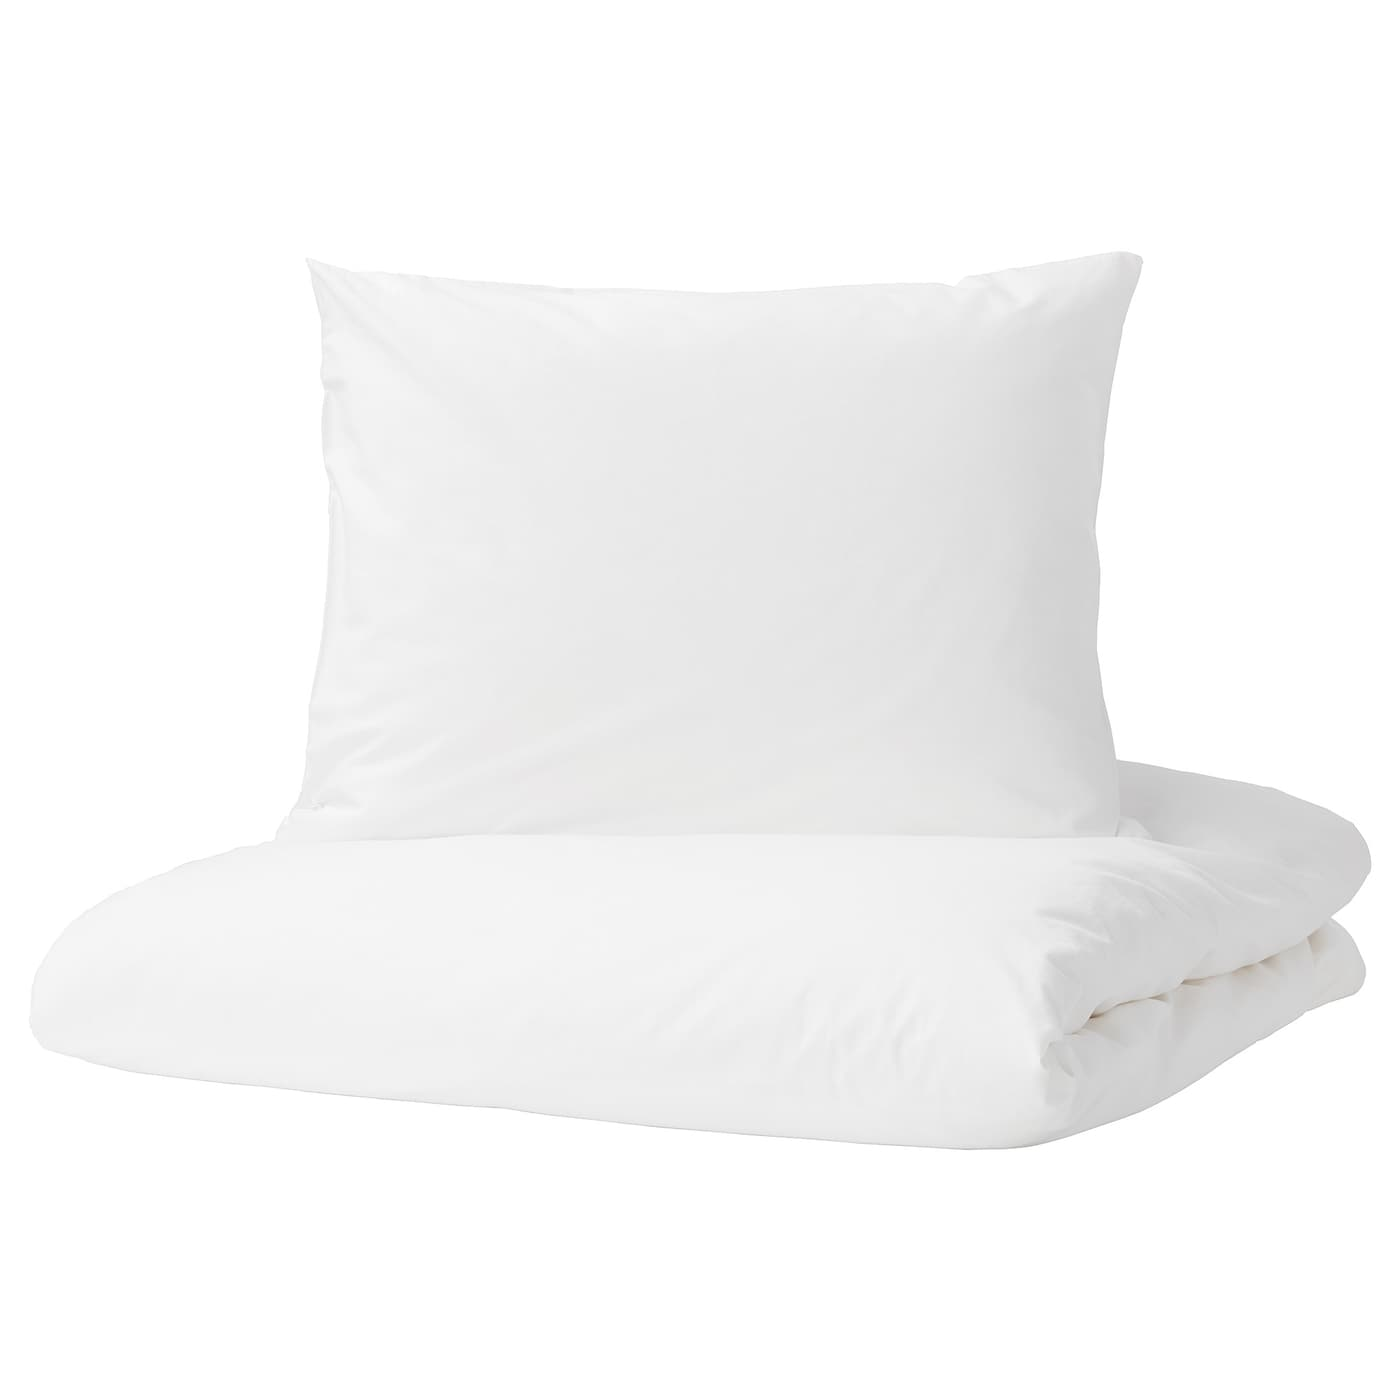 h nsb r couette chaude 150 x 200 cm ikea. Black Bedroom Furniture Sets. Home Design Ideas